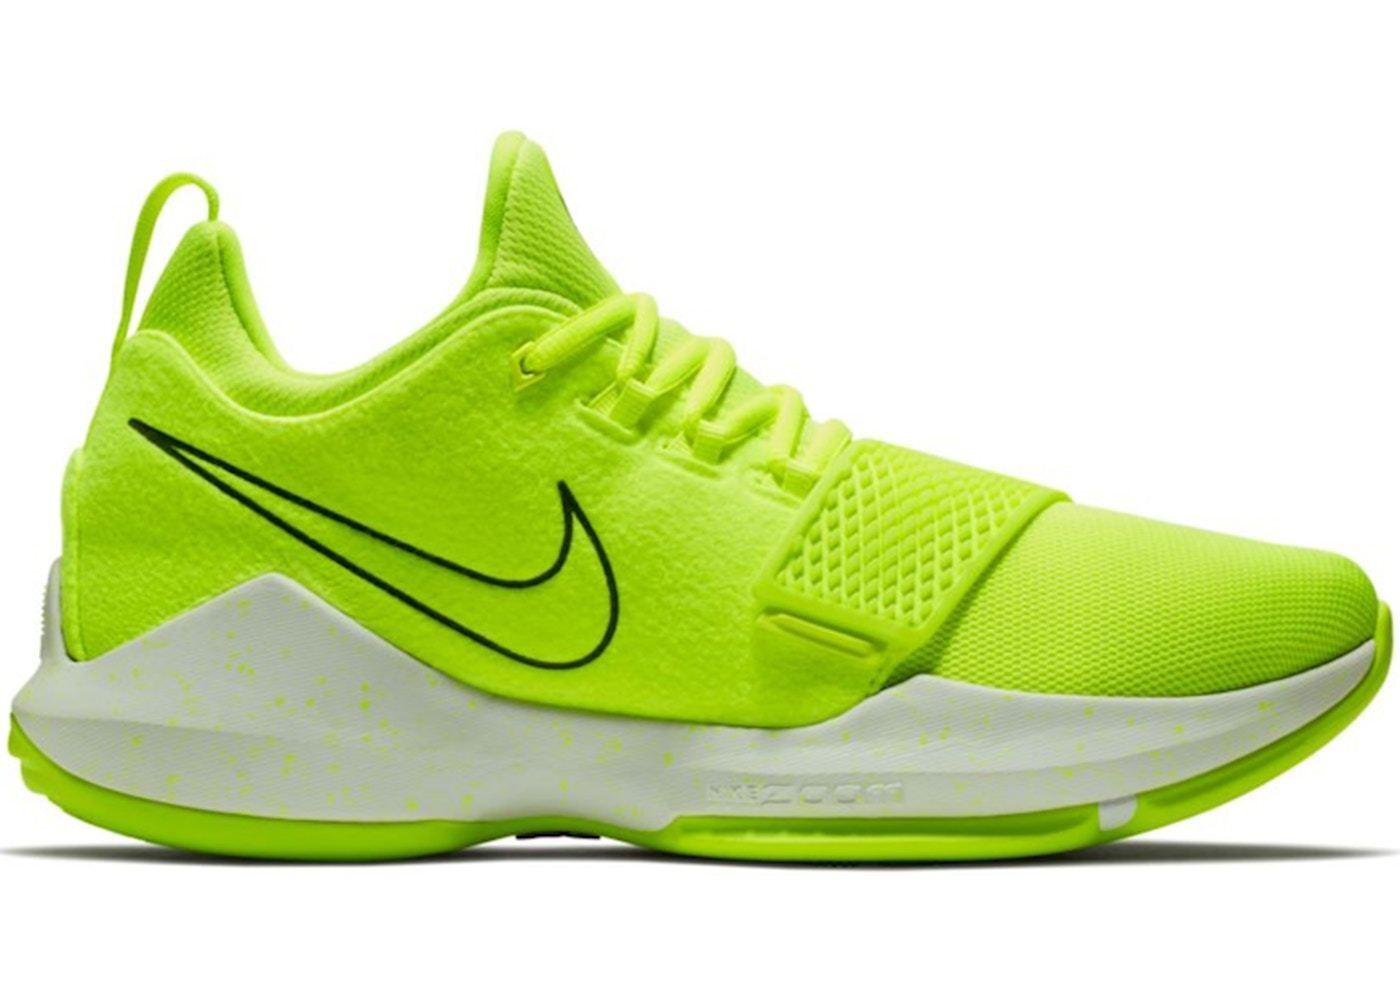 new style 55da8 4f83f ... get nike pg 1 volt paul george tennis ball volt 1 neon yellow green  white 95